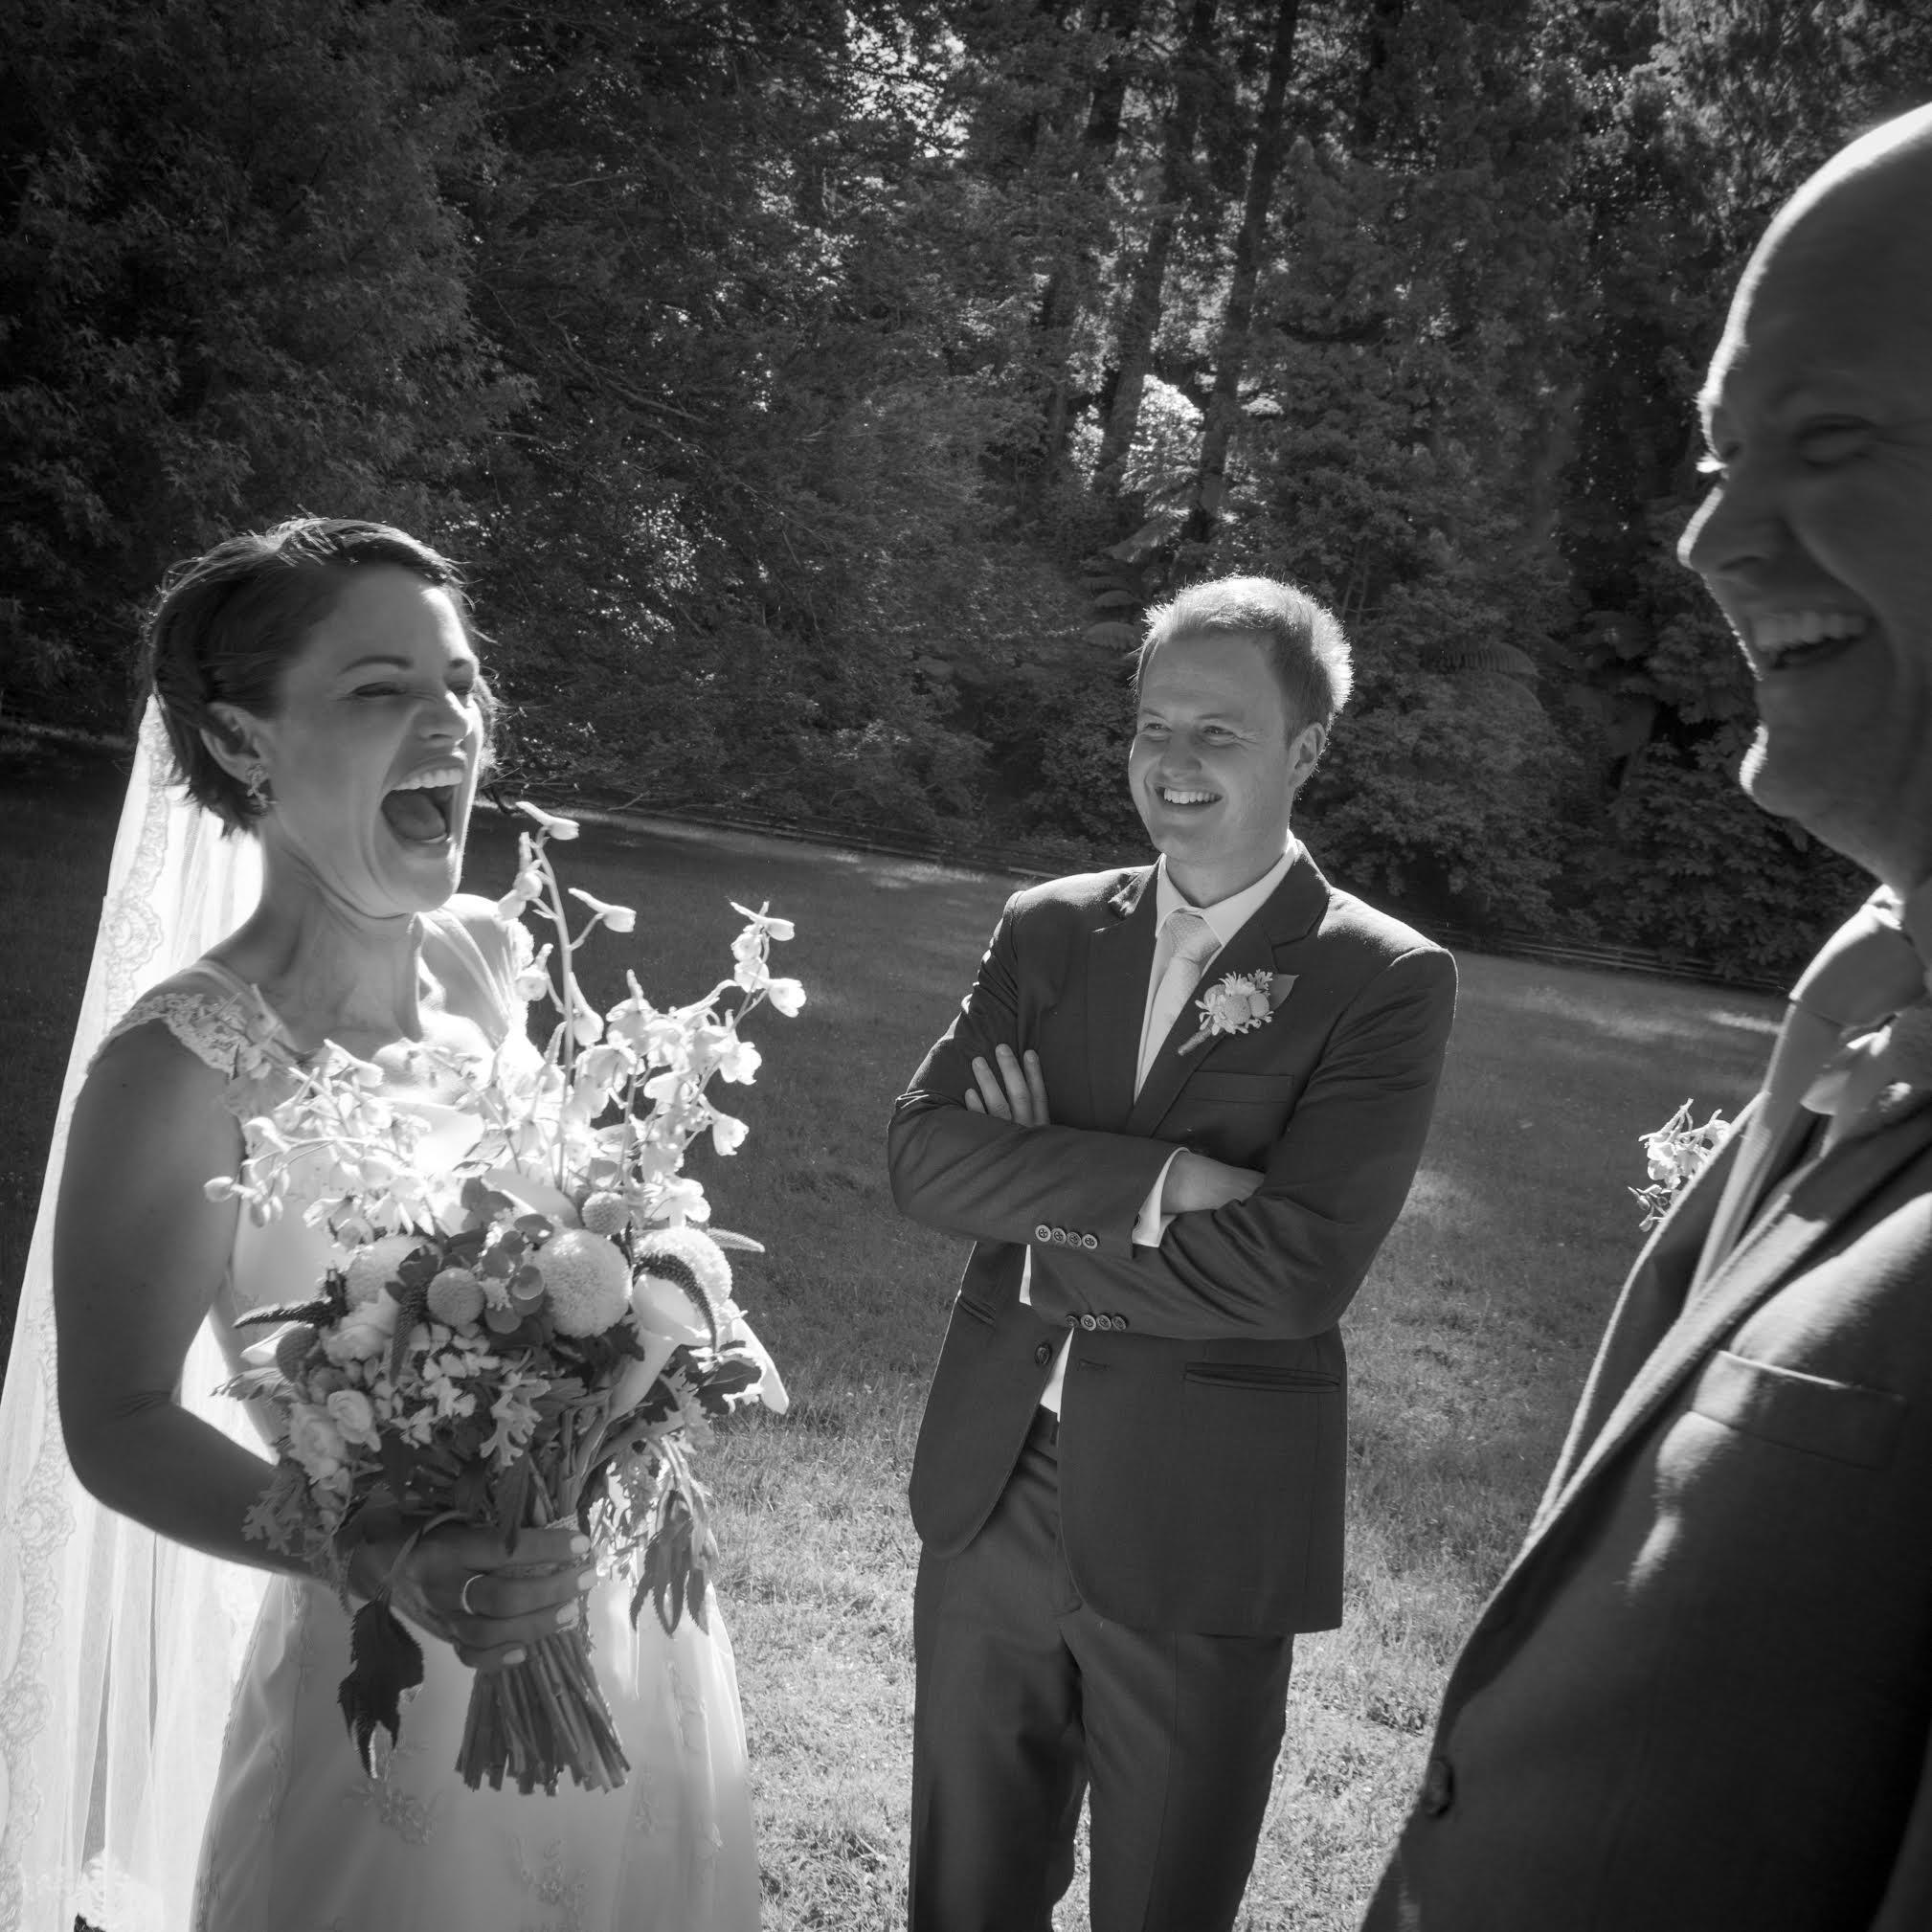 Tony Carter Photography Weddings Homepage 6.jpg